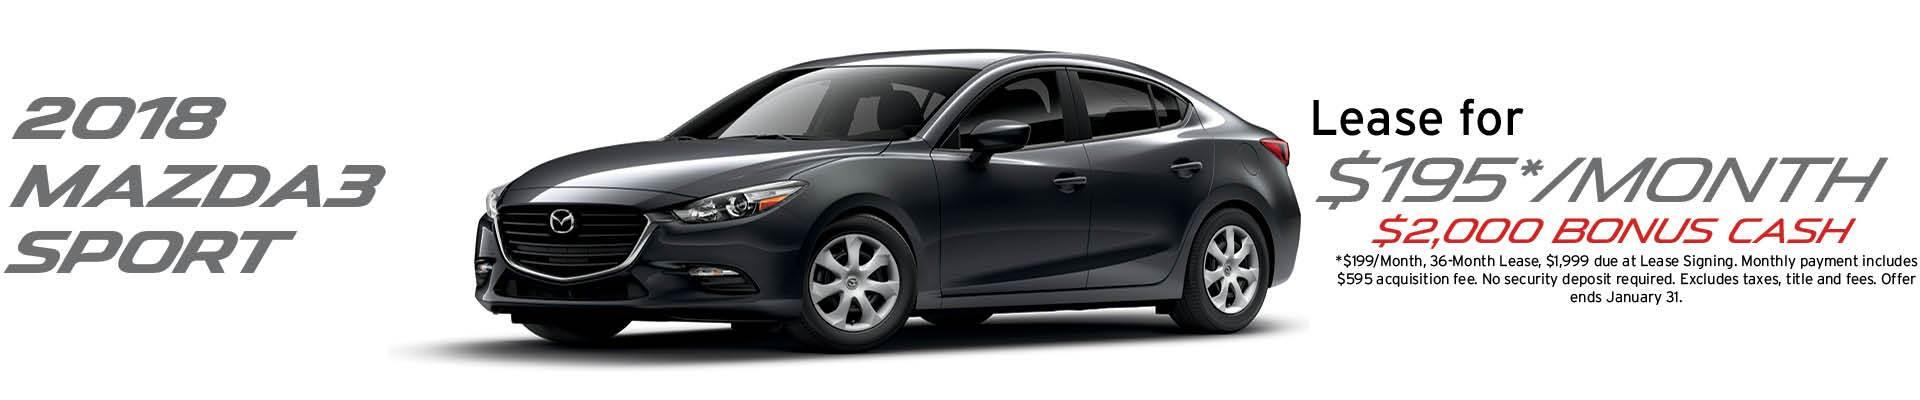 2018 Mazda3 Sport lease offer banner